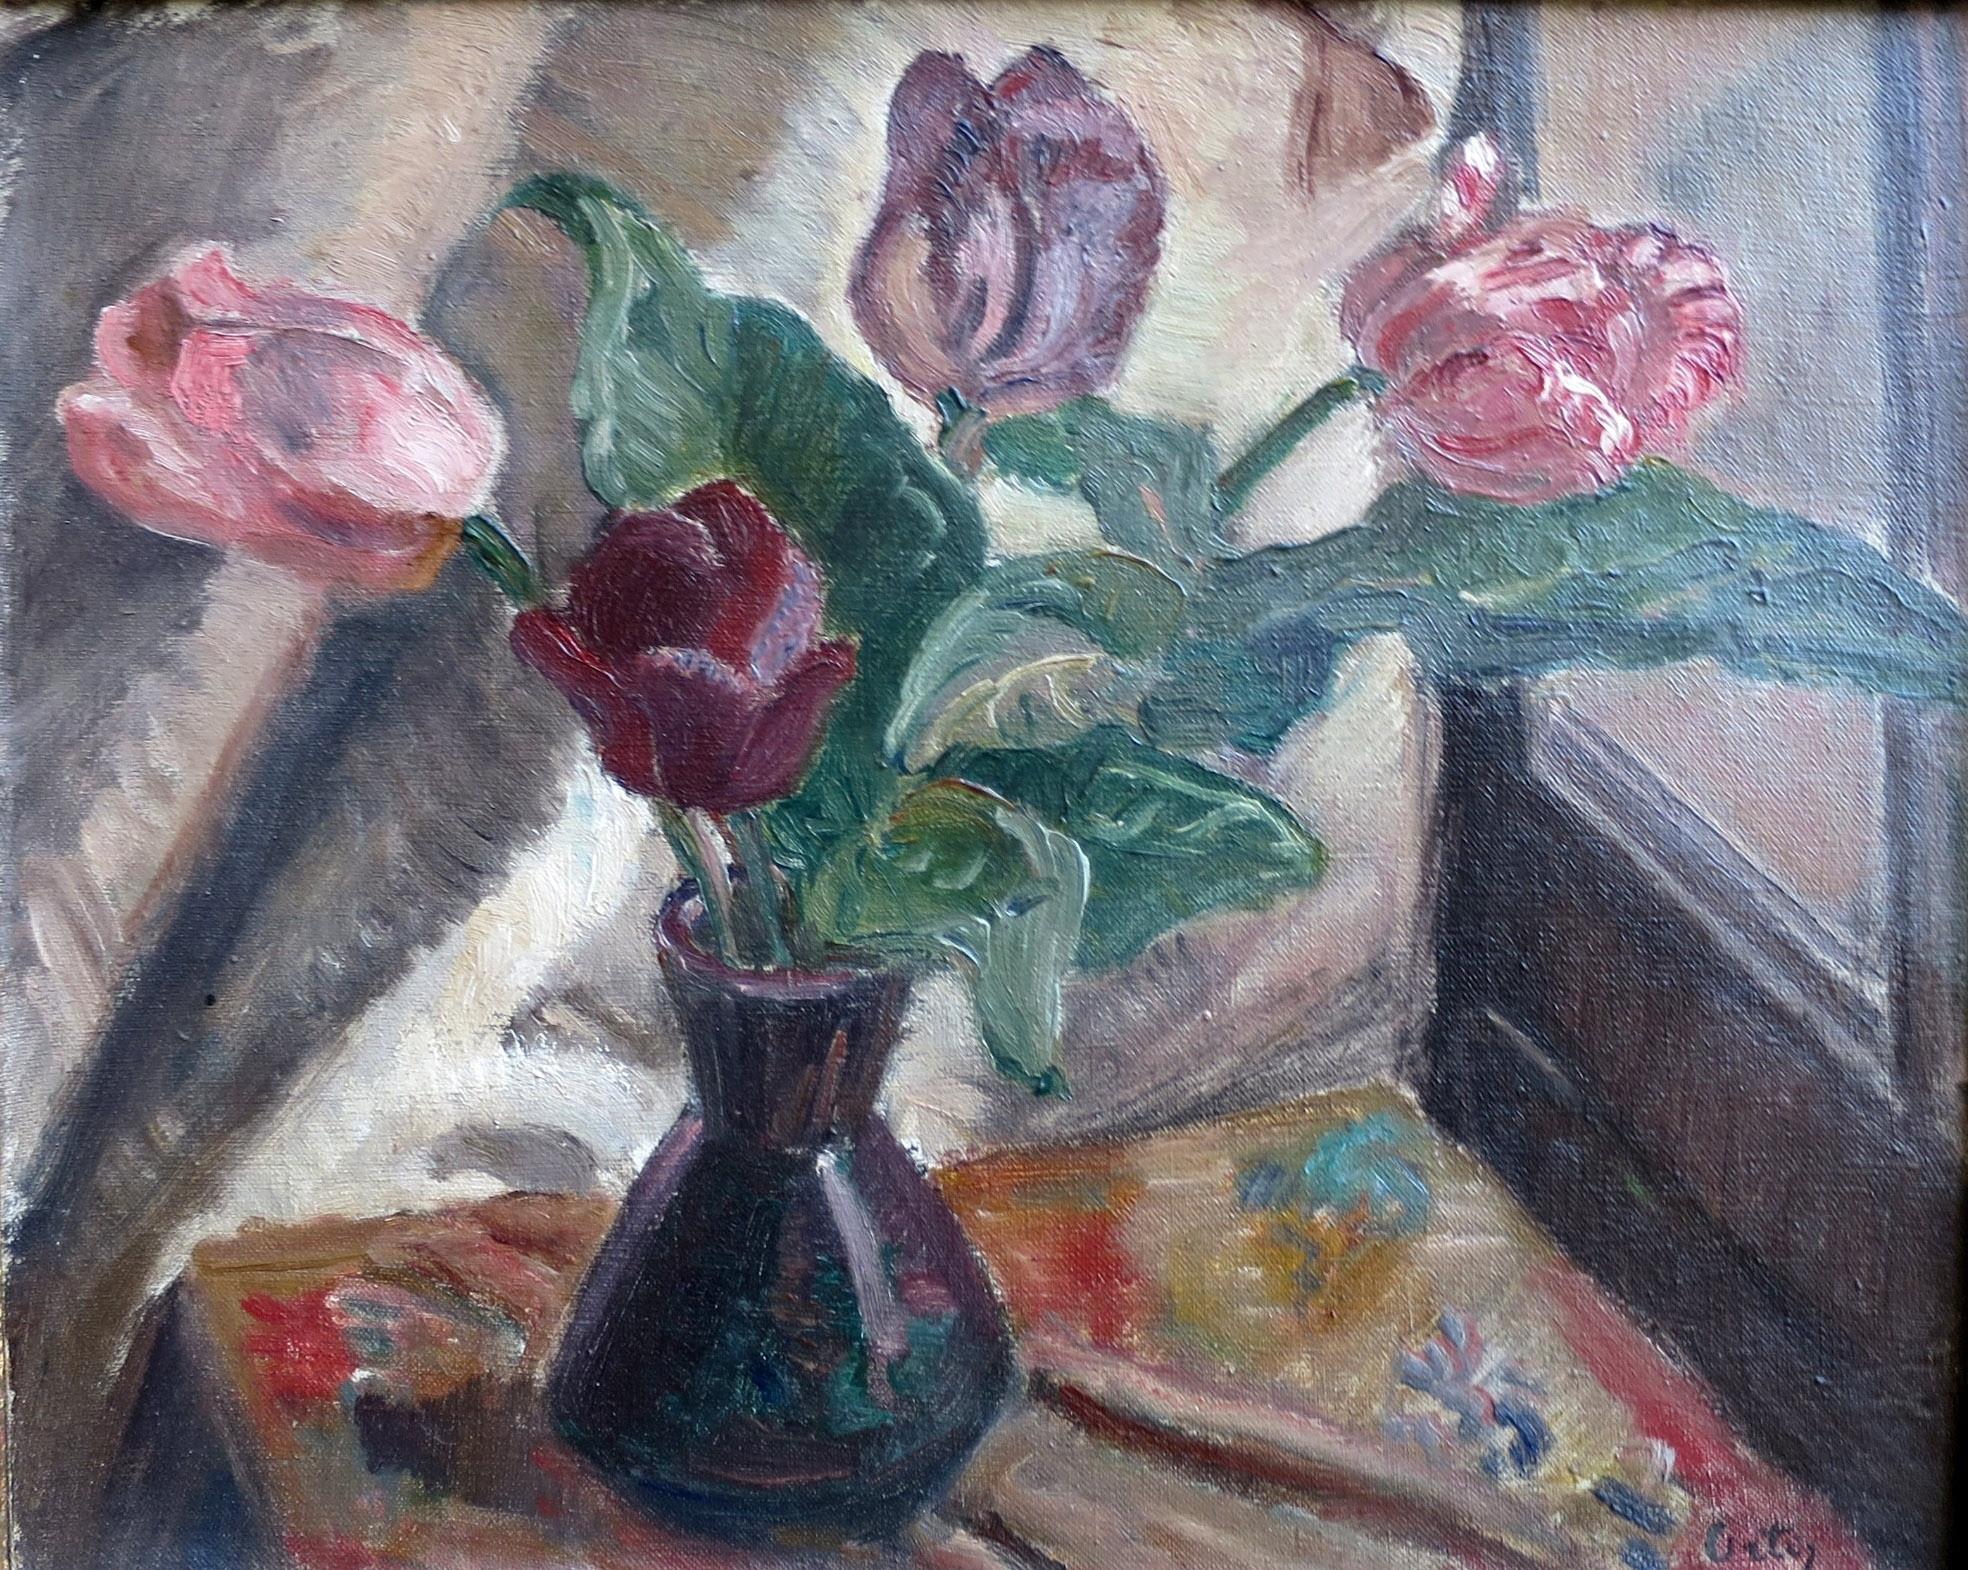 vw beetle vase of 25 luxury flower vase painting watercolor flower decoration ideas with flower vase painting watercolor elegant manuel ortiz de zarate flowers in a vase